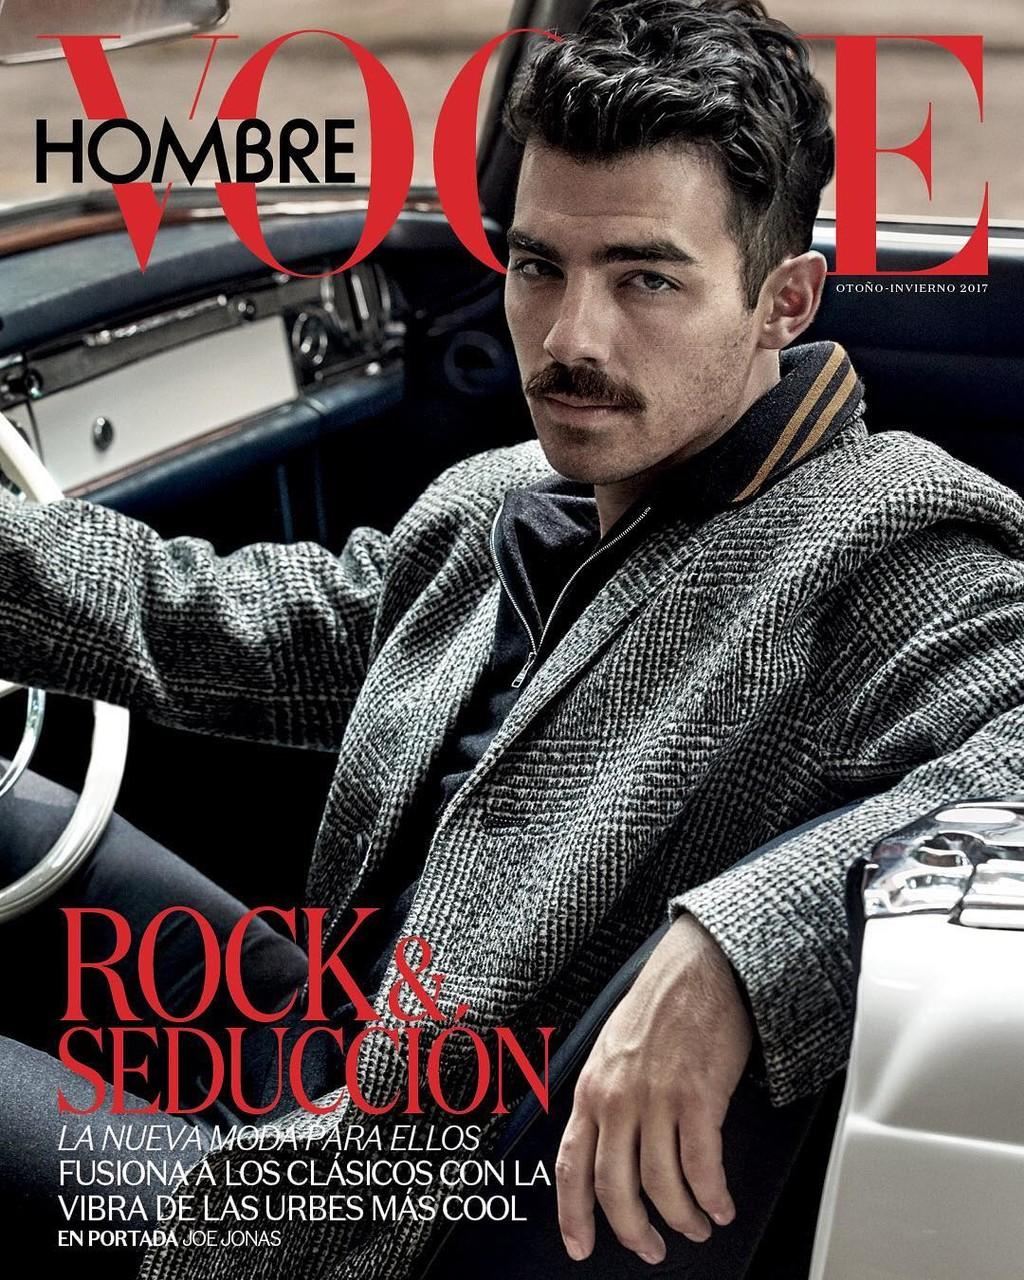 Joe Jonas Bogue Hombre Portada Mexico